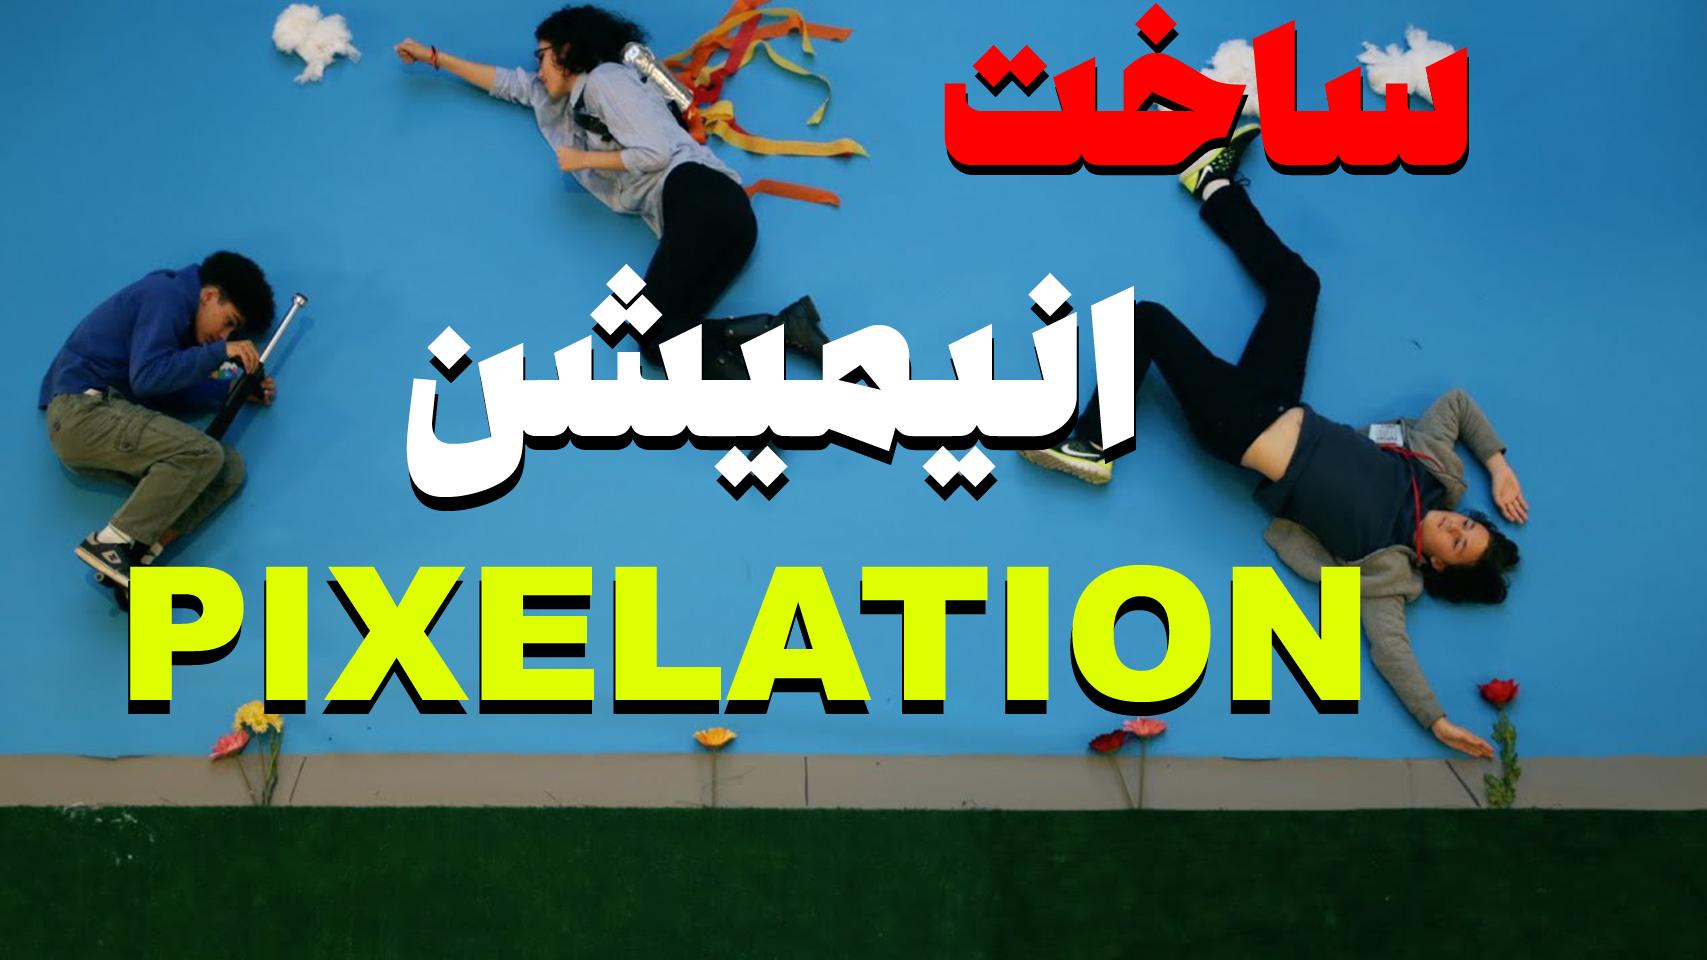 ساخت انیمیشن Pixelation